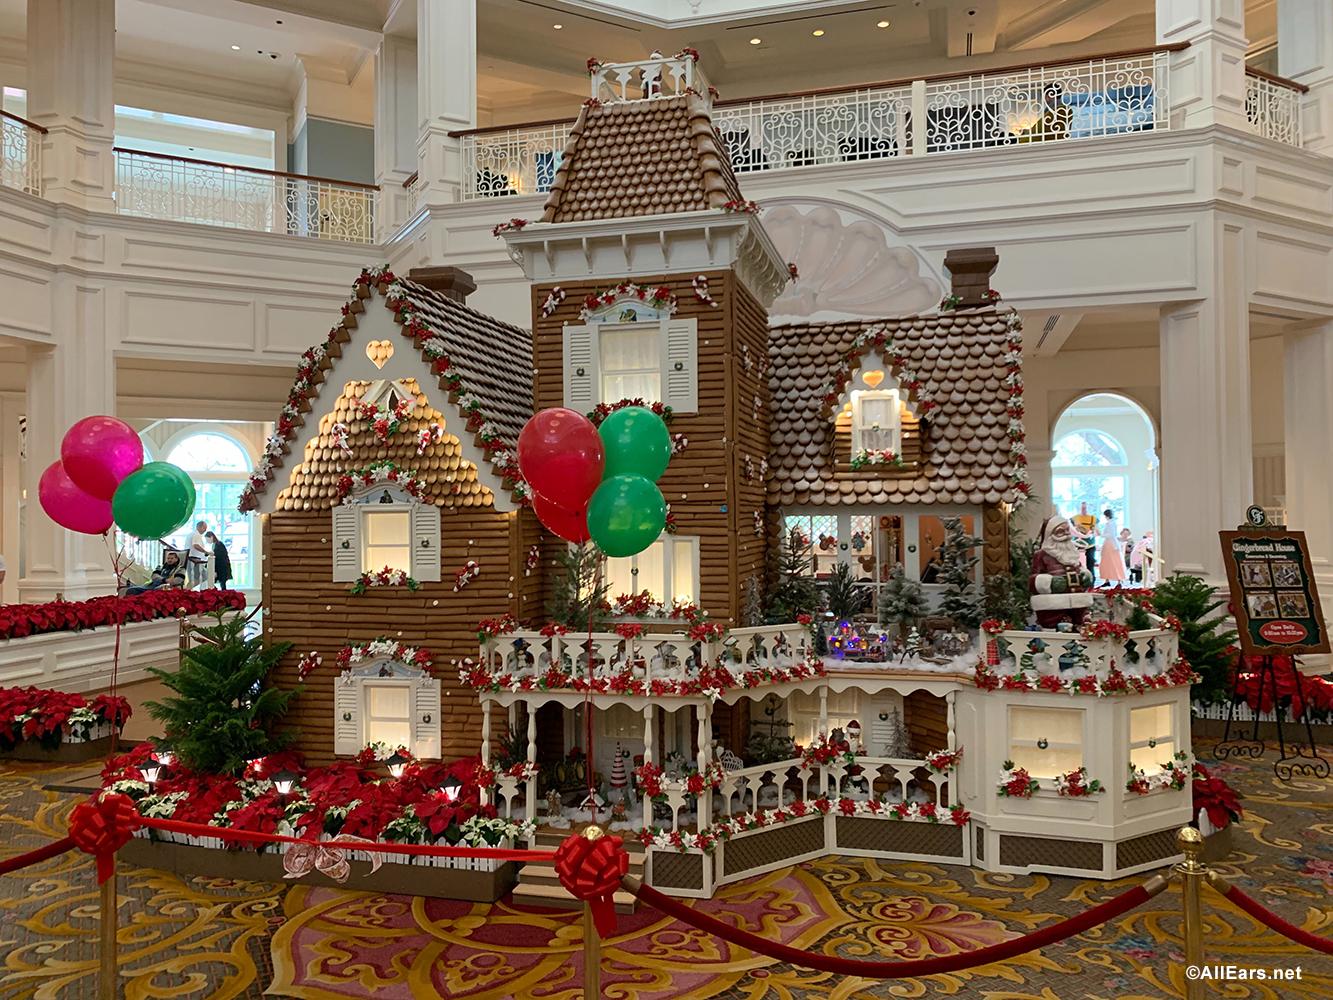 Disney S Grand Floridian Gingerbread House Open For 2019 Season